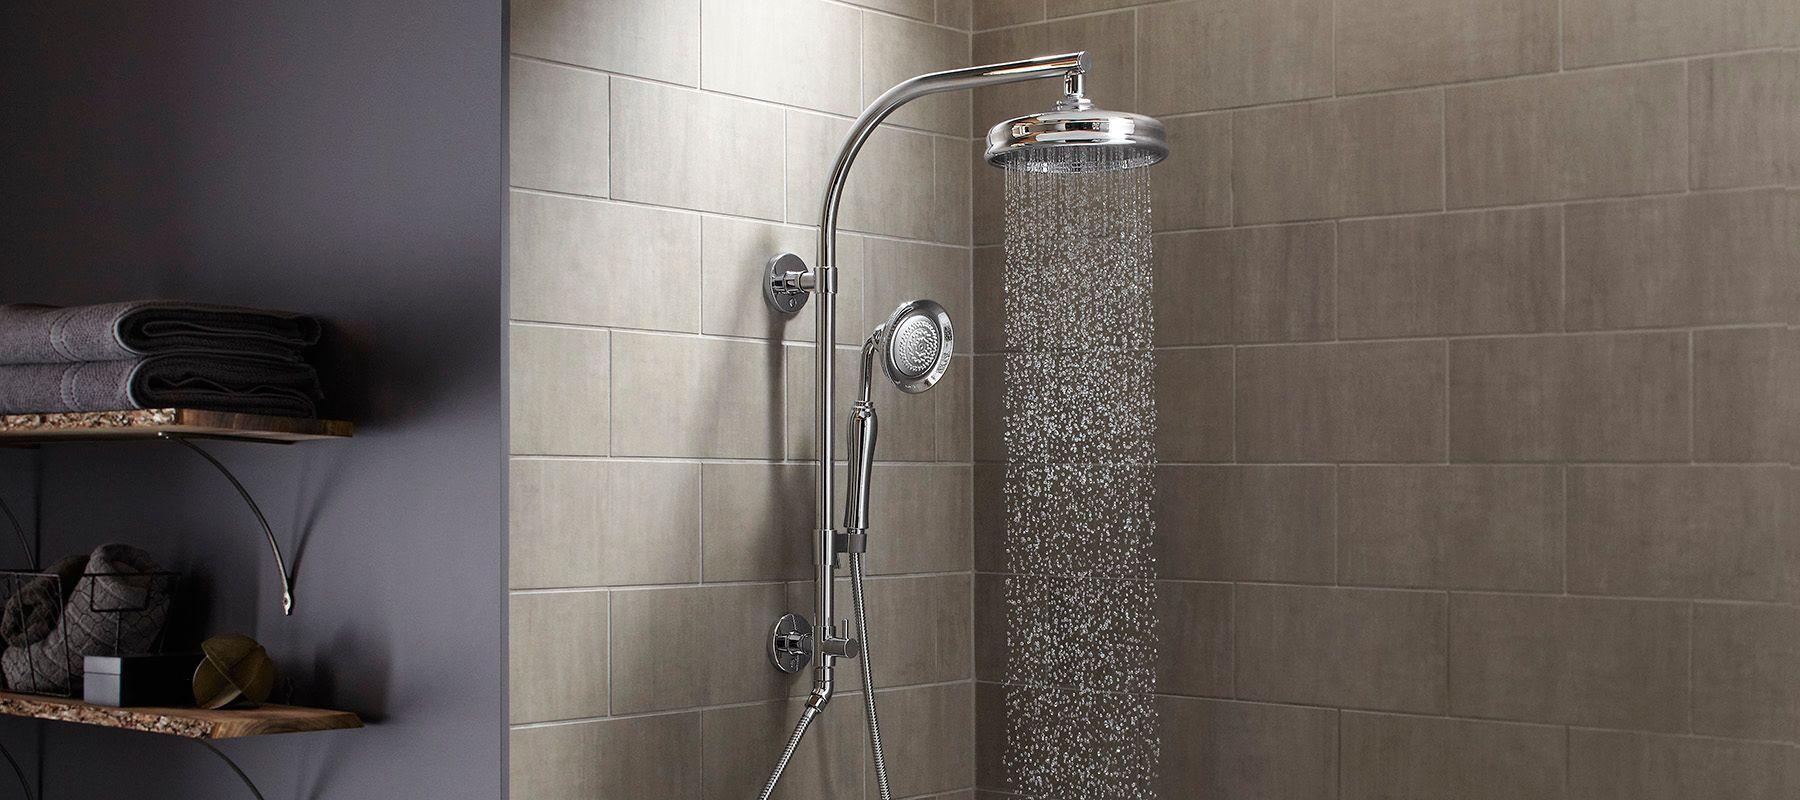 Shower-head-1, Kitchen Renovation, Bathroom Renovation, House Renovation Auckland